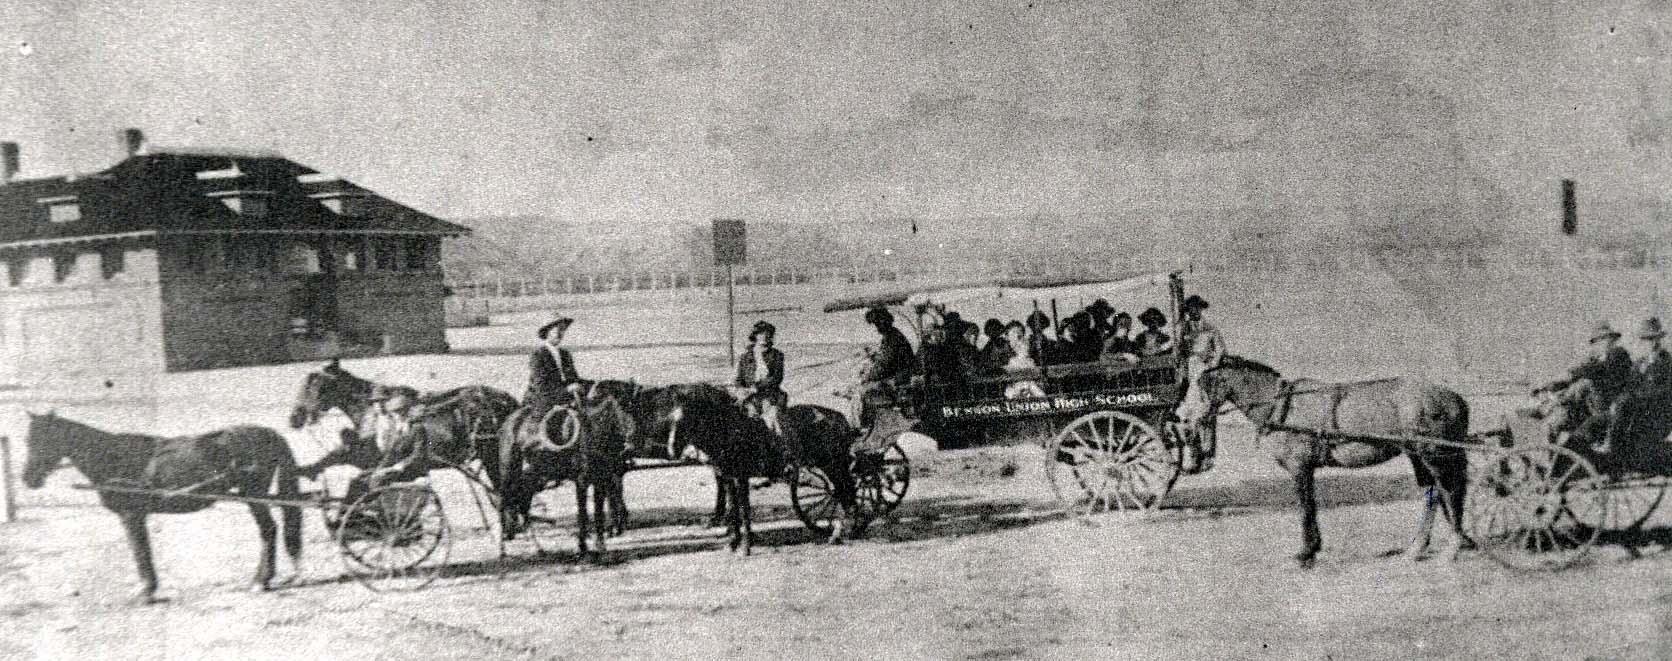 Horsedrawn School Bus